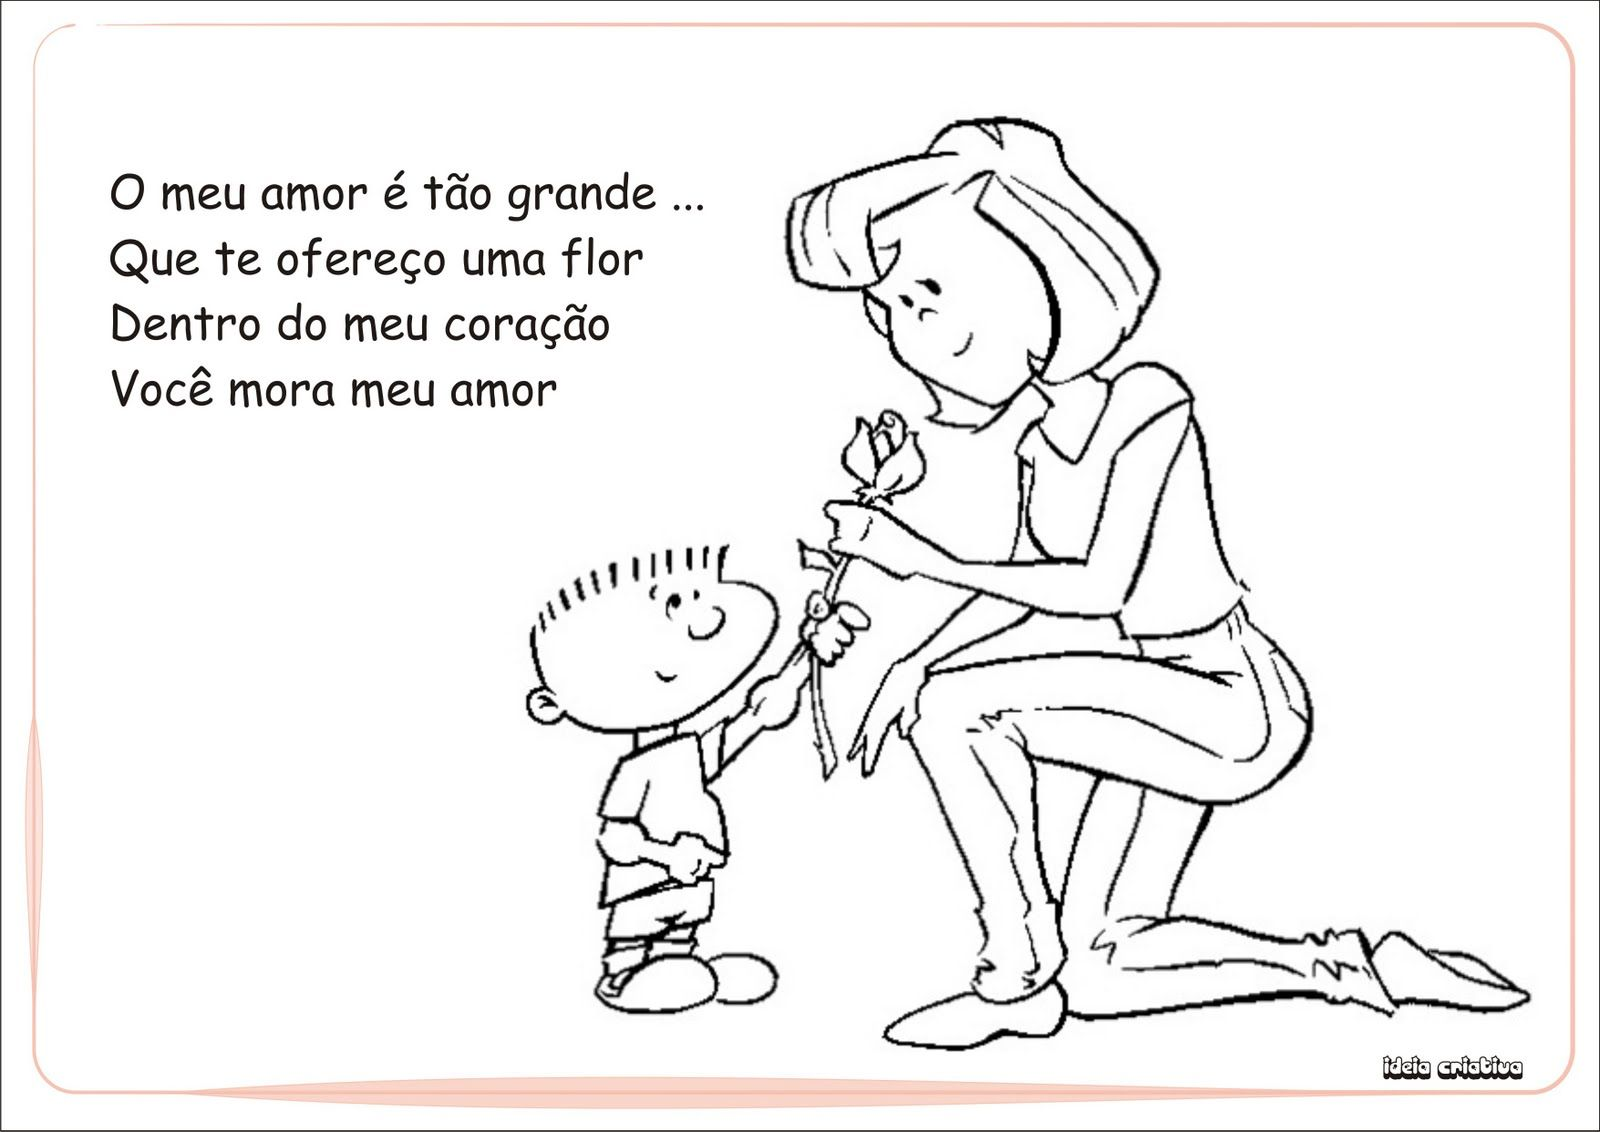 Album Homenagem Dia Das Maes Educacao Infantil Educacao Infantil